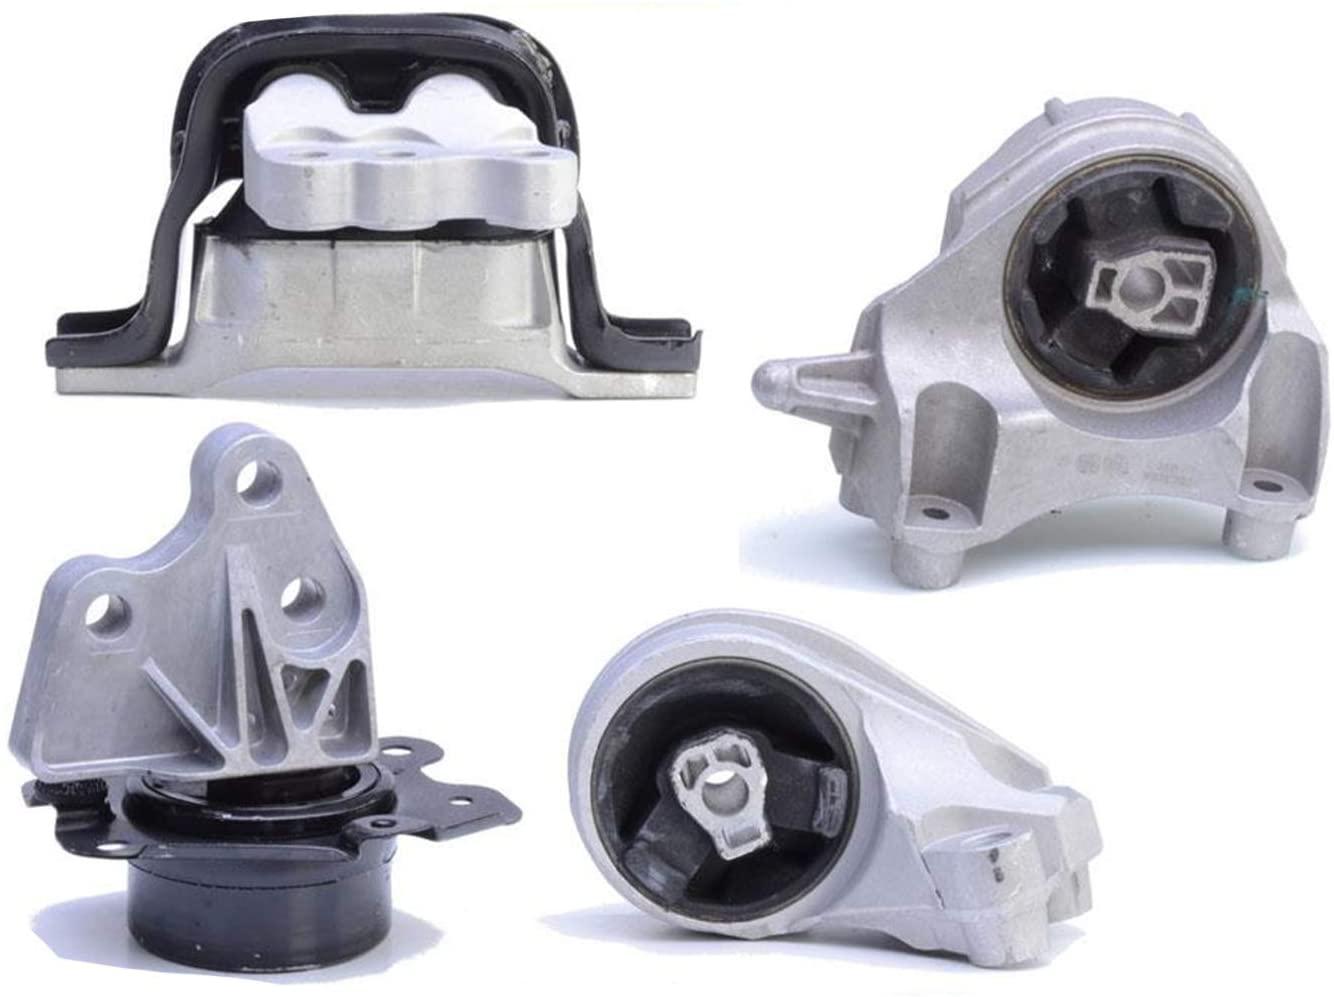 100% New Engine Motor Transmission Mounts 4 pcs For 10-17 Chevrolet Equinox GMC Terrain 2.4L 4 Cylinder